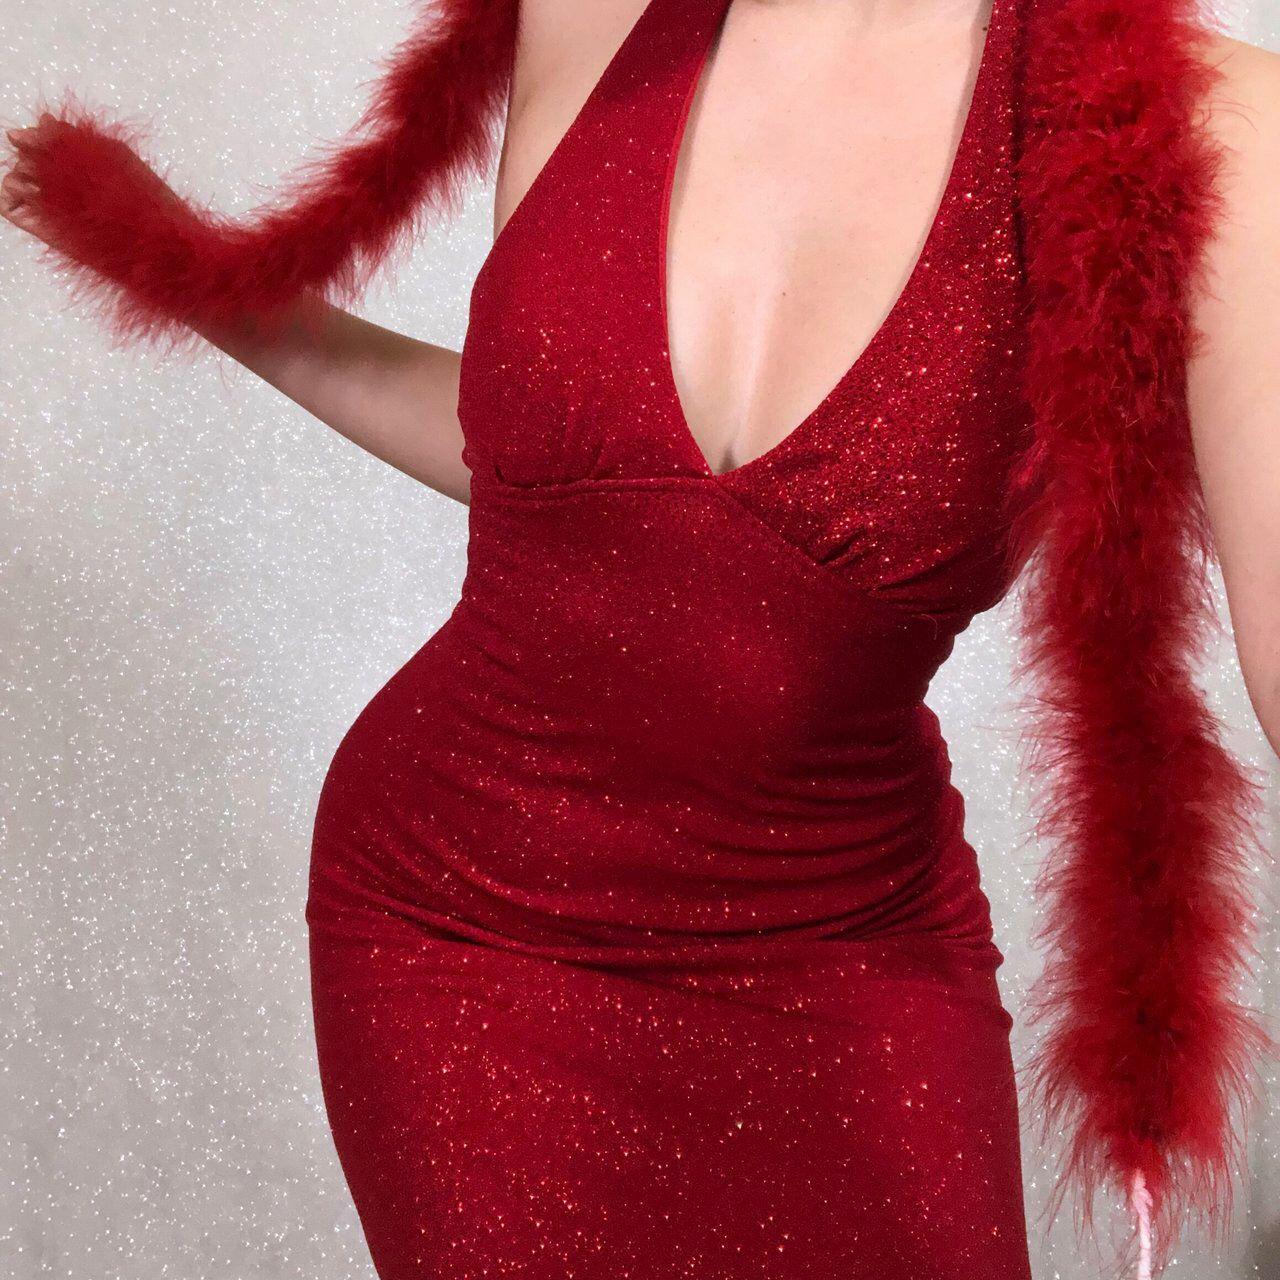 9e15737542d5 Listed on Depop by heshecherie | depop | Depop, Formal dresses, Dresses